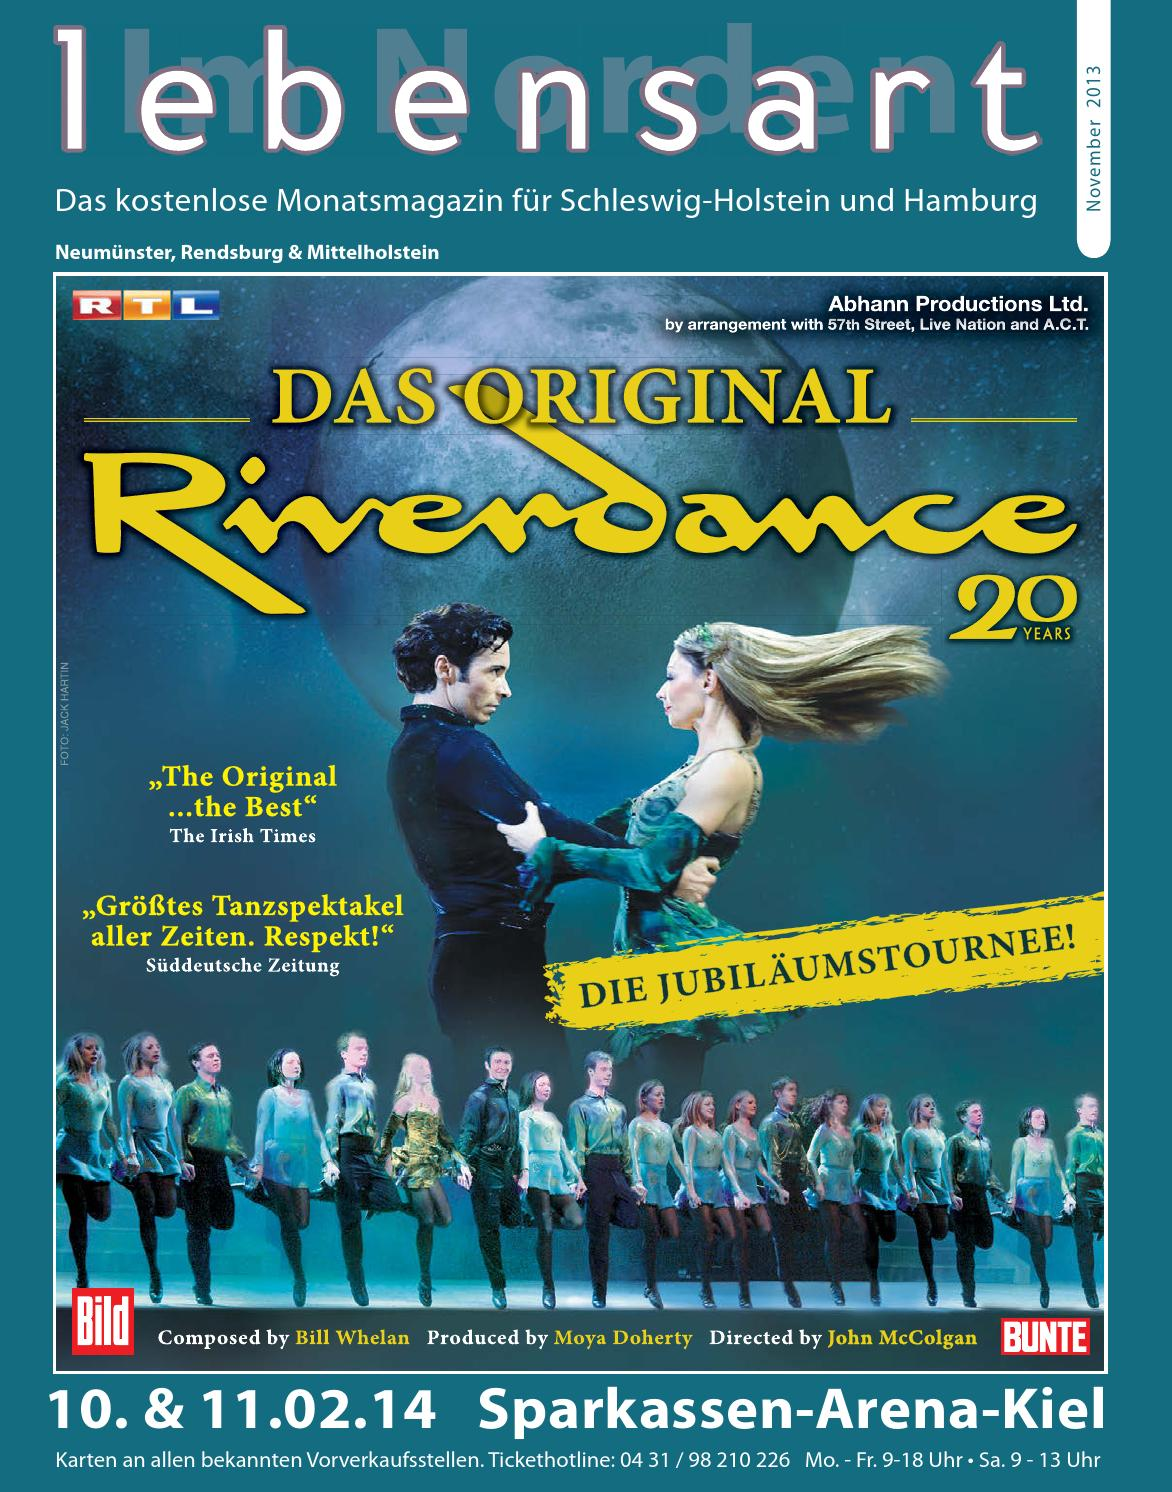 Lebensart Im Norden Neumünster November 2013 By Verlagskontor